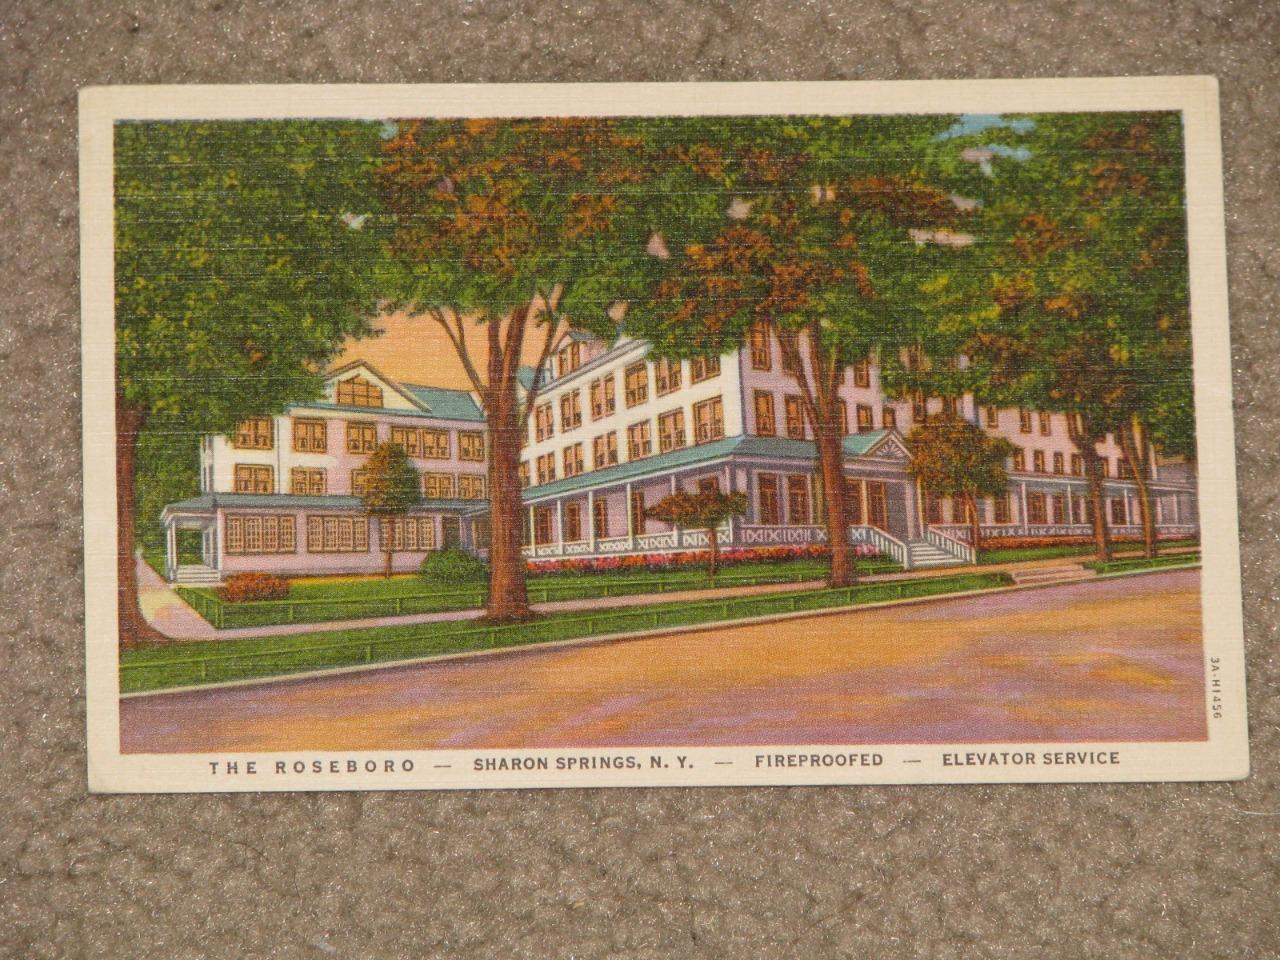 The Roseboro, Sharon Springs, N.Y., Fireproofed & Elevator Service-vintage card